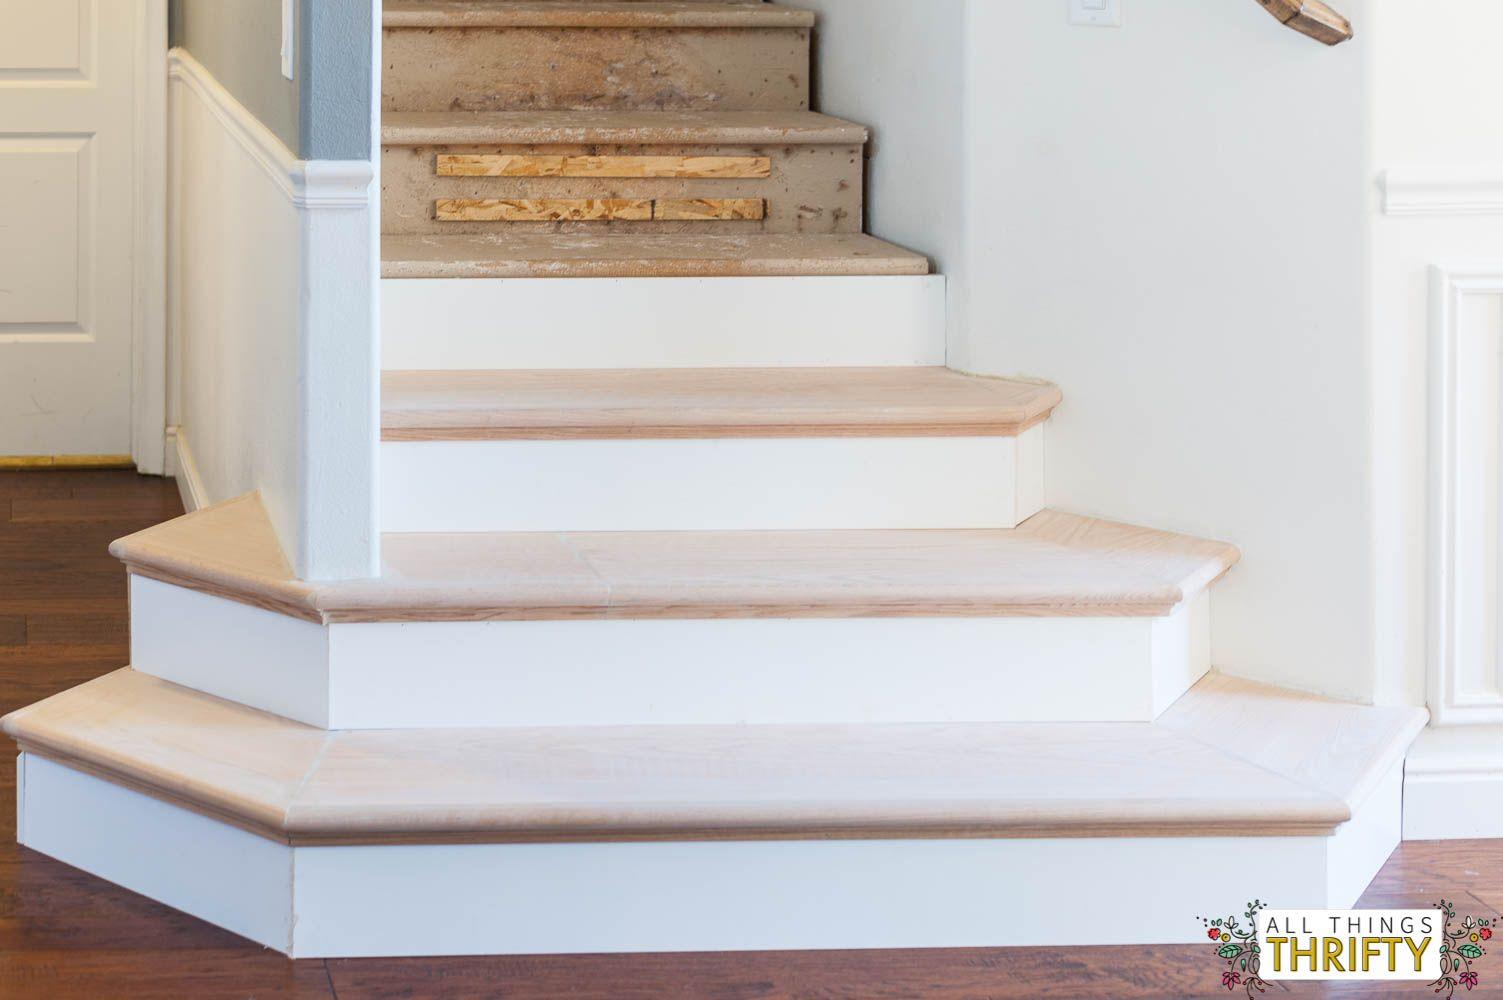 DIY Staircase Remodel | Stair Covers | Stair Caps | Stair Facing | Stair  Refacing | Stair Parts | Hardwood Stairs